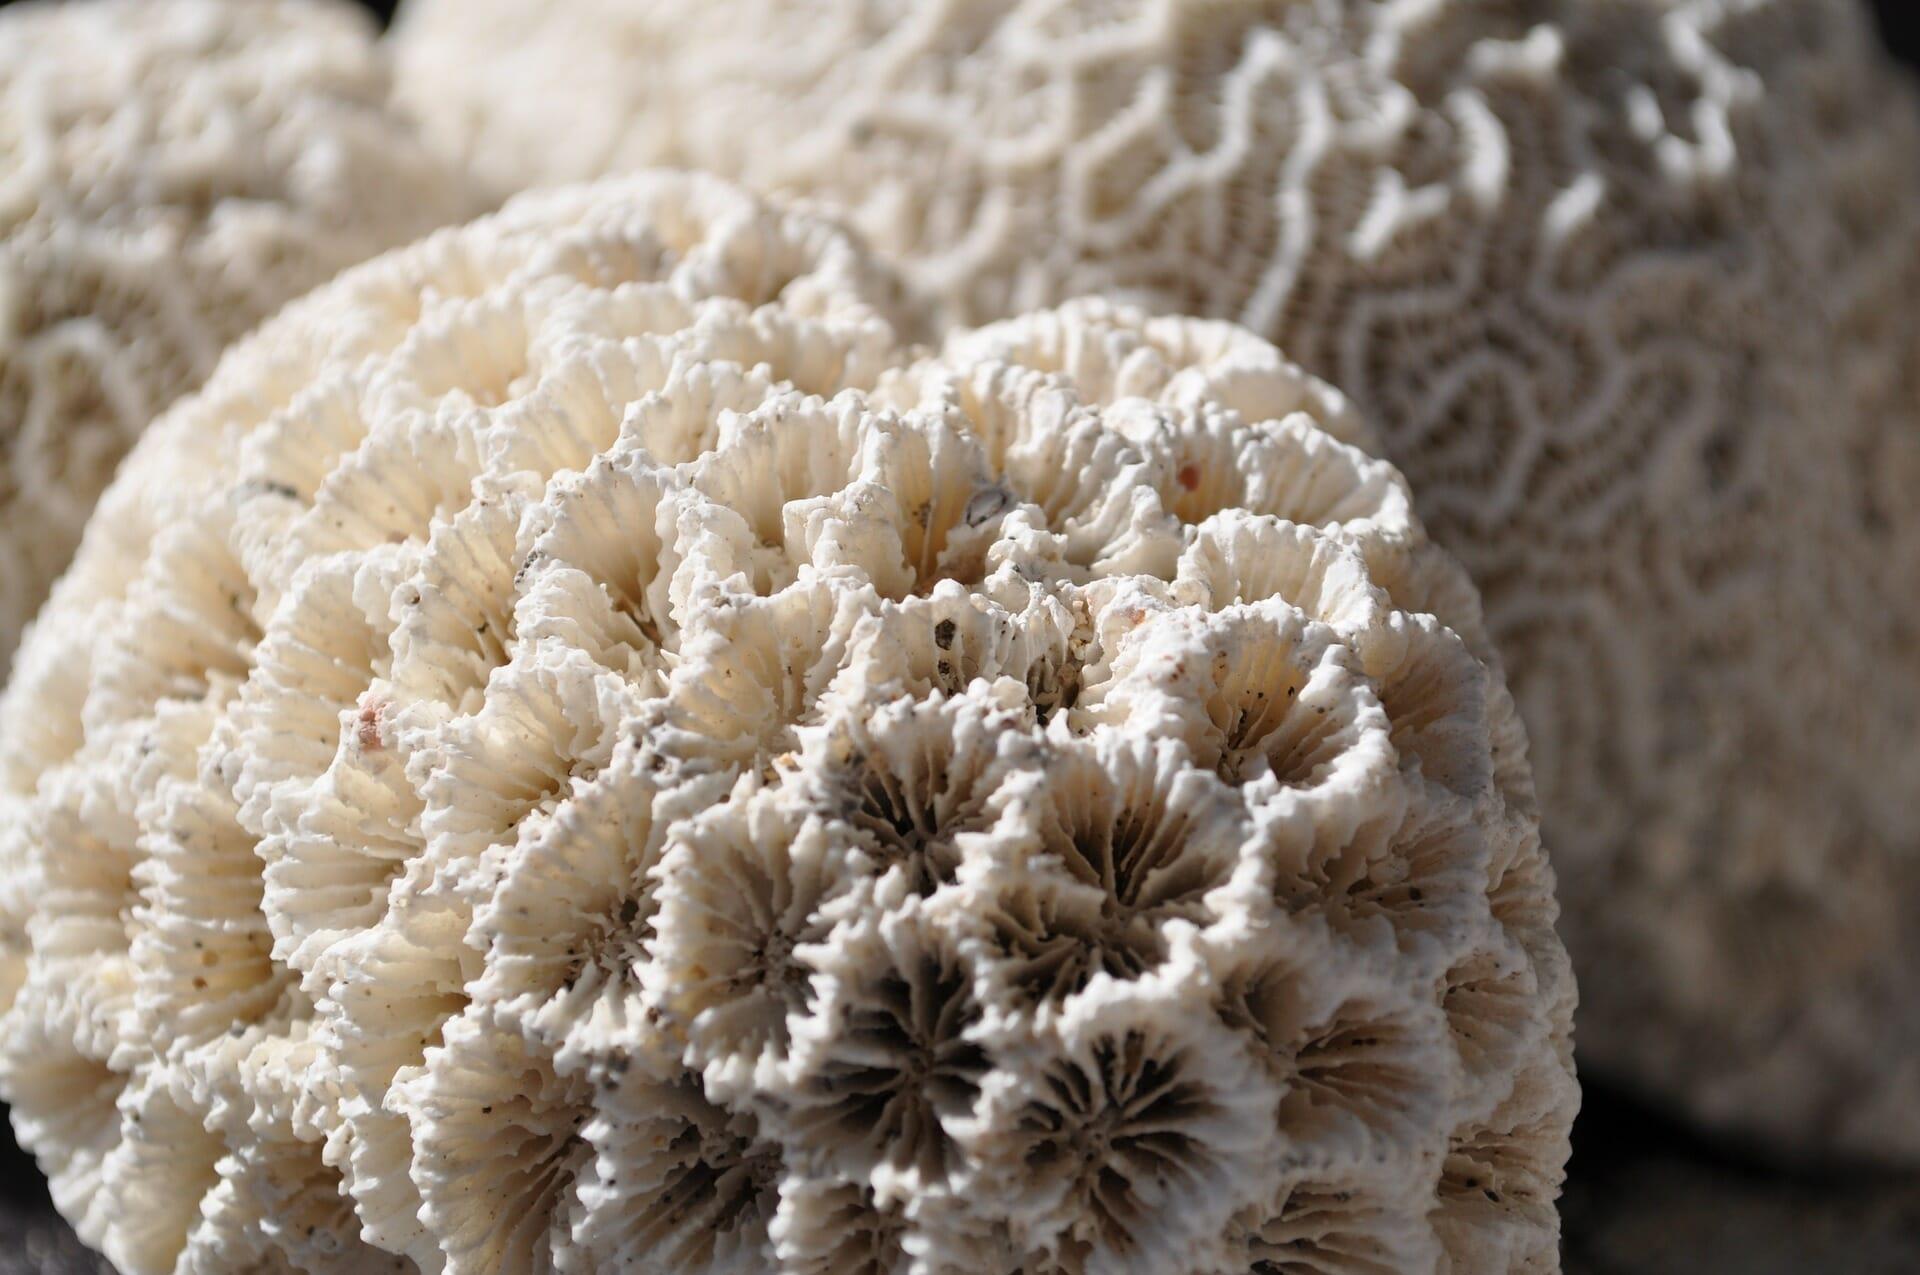 corail-mort-creme-solaires